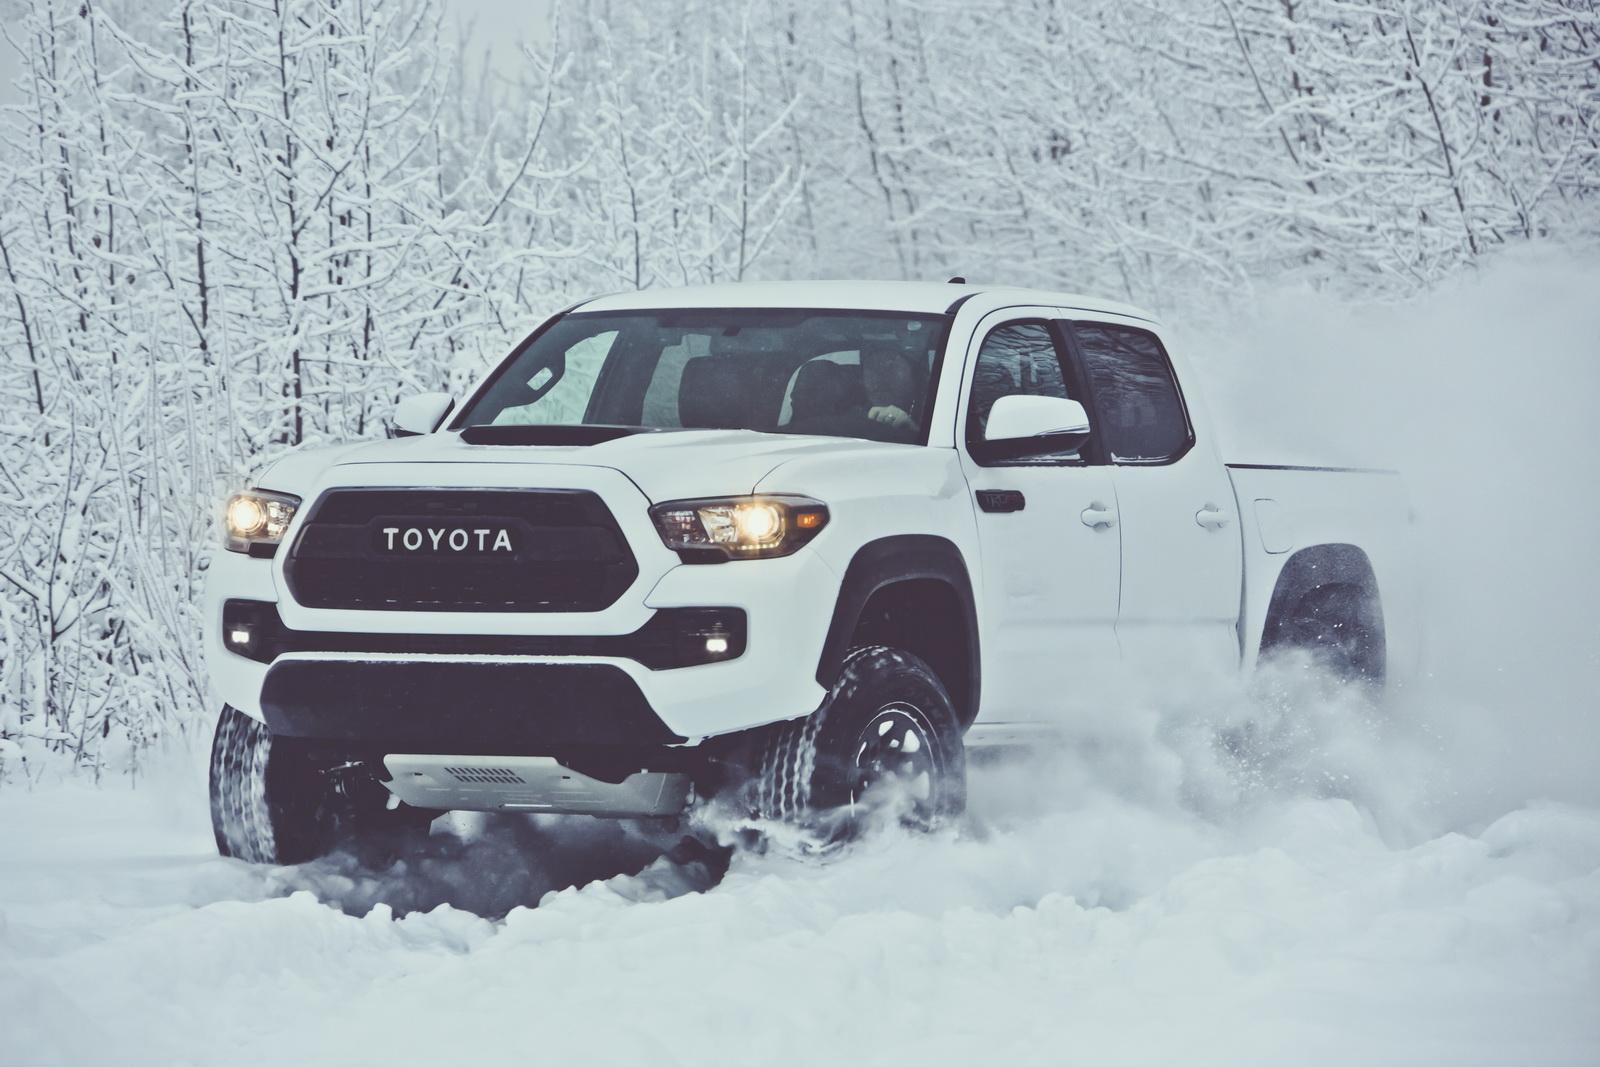 2017_Toyota_Tacoma_TRD_Pro_01_A98B77F6FAD8BA78D991C567F21B3F9C971F0627